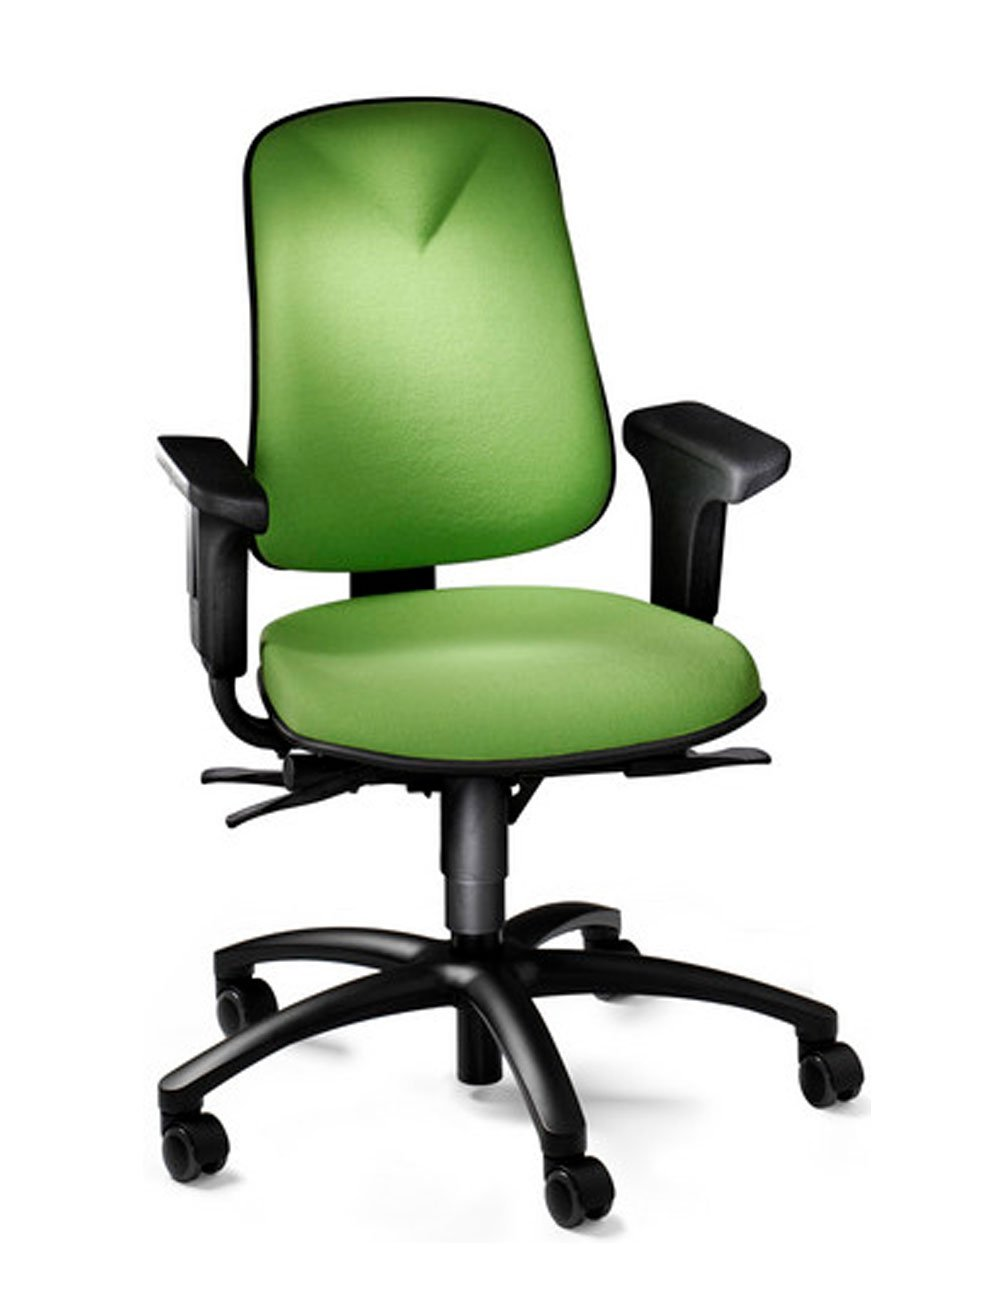 Hoganasmobler ergonomic office chair 361 slim online for Chair design ergonomics